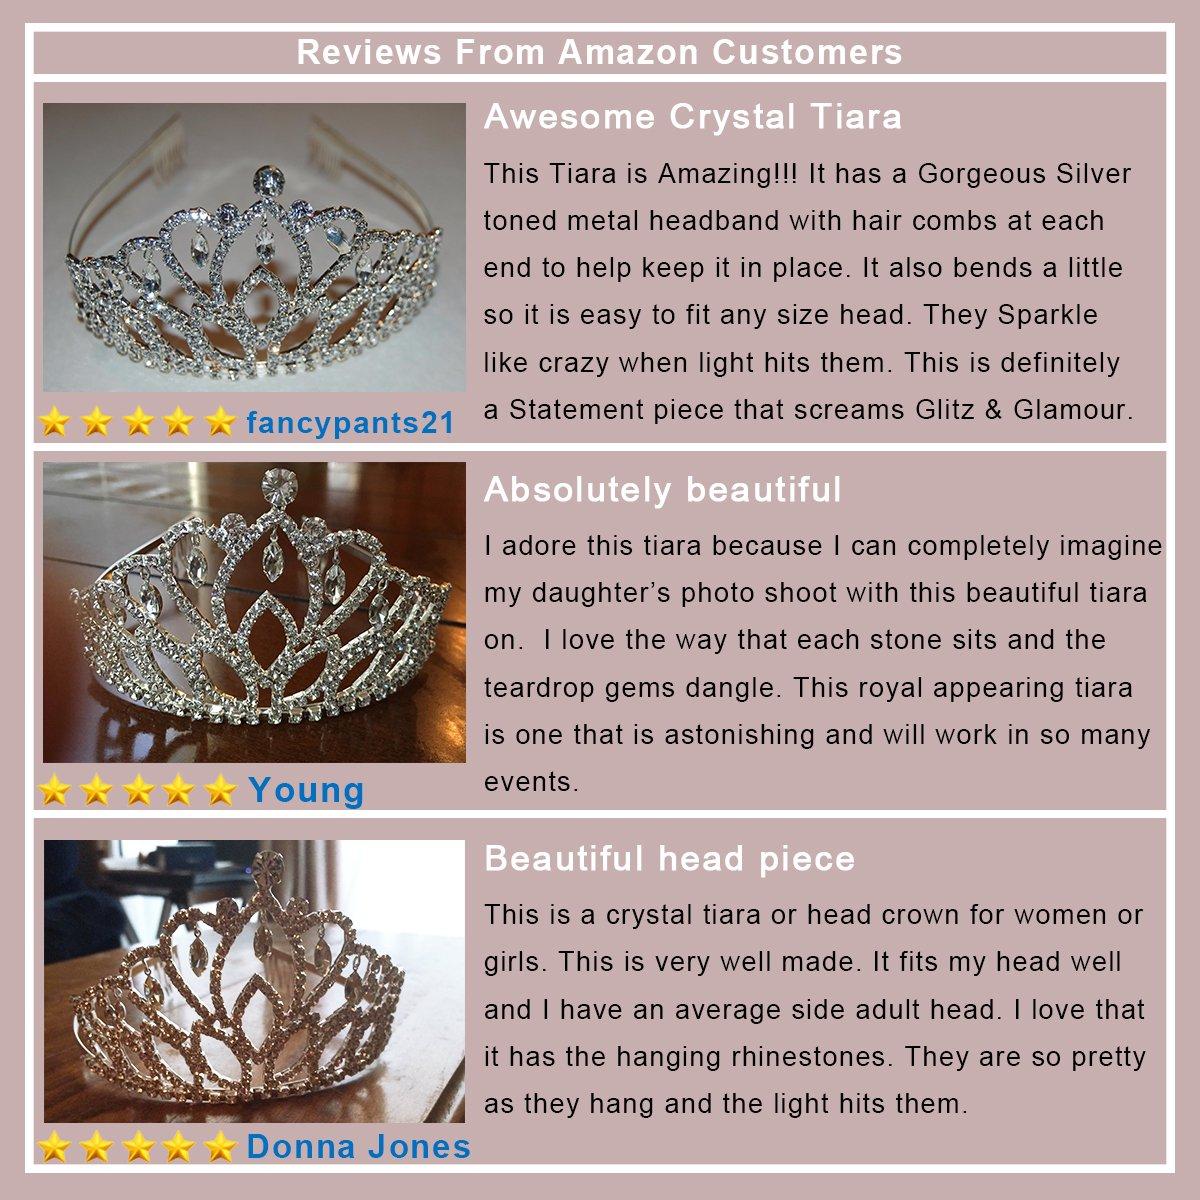 Elegant Tiara Crystal Hair Crown - Rhinestones Headband for Queen, Bridal, Princess in Wedding, Party and Birthday 1-2 - by NIPOO by Nipoo (Image #6)